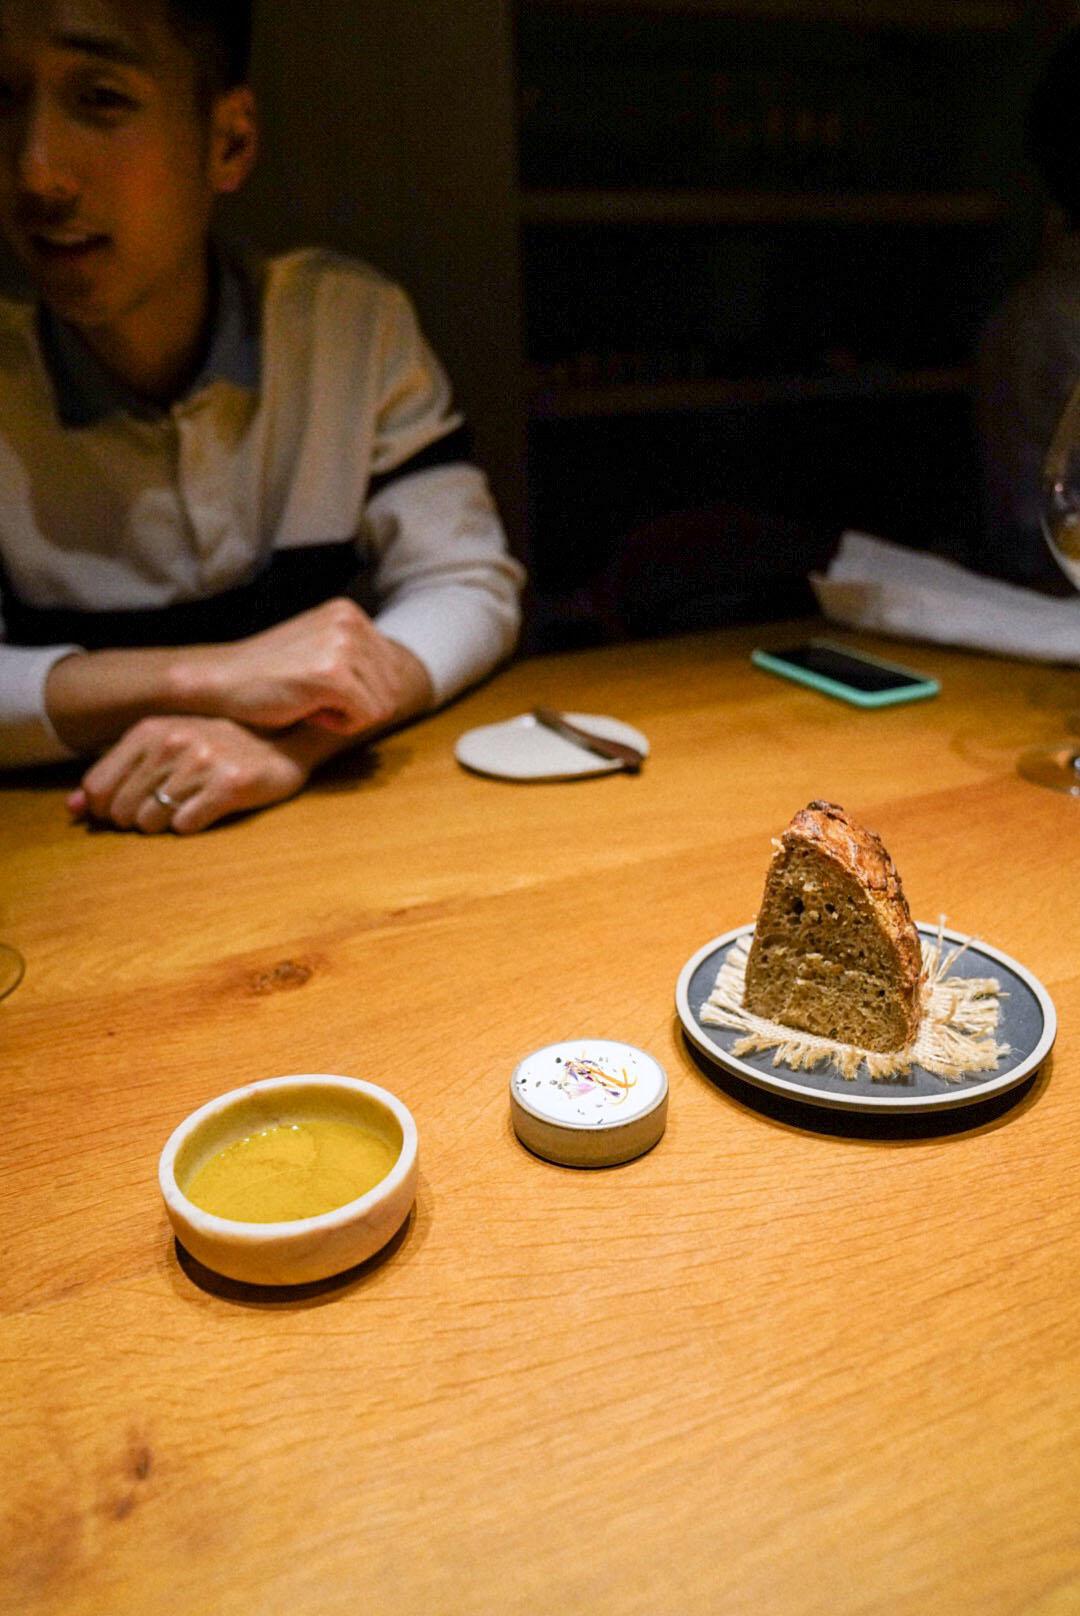 Sourdough bread, butter, olive oil